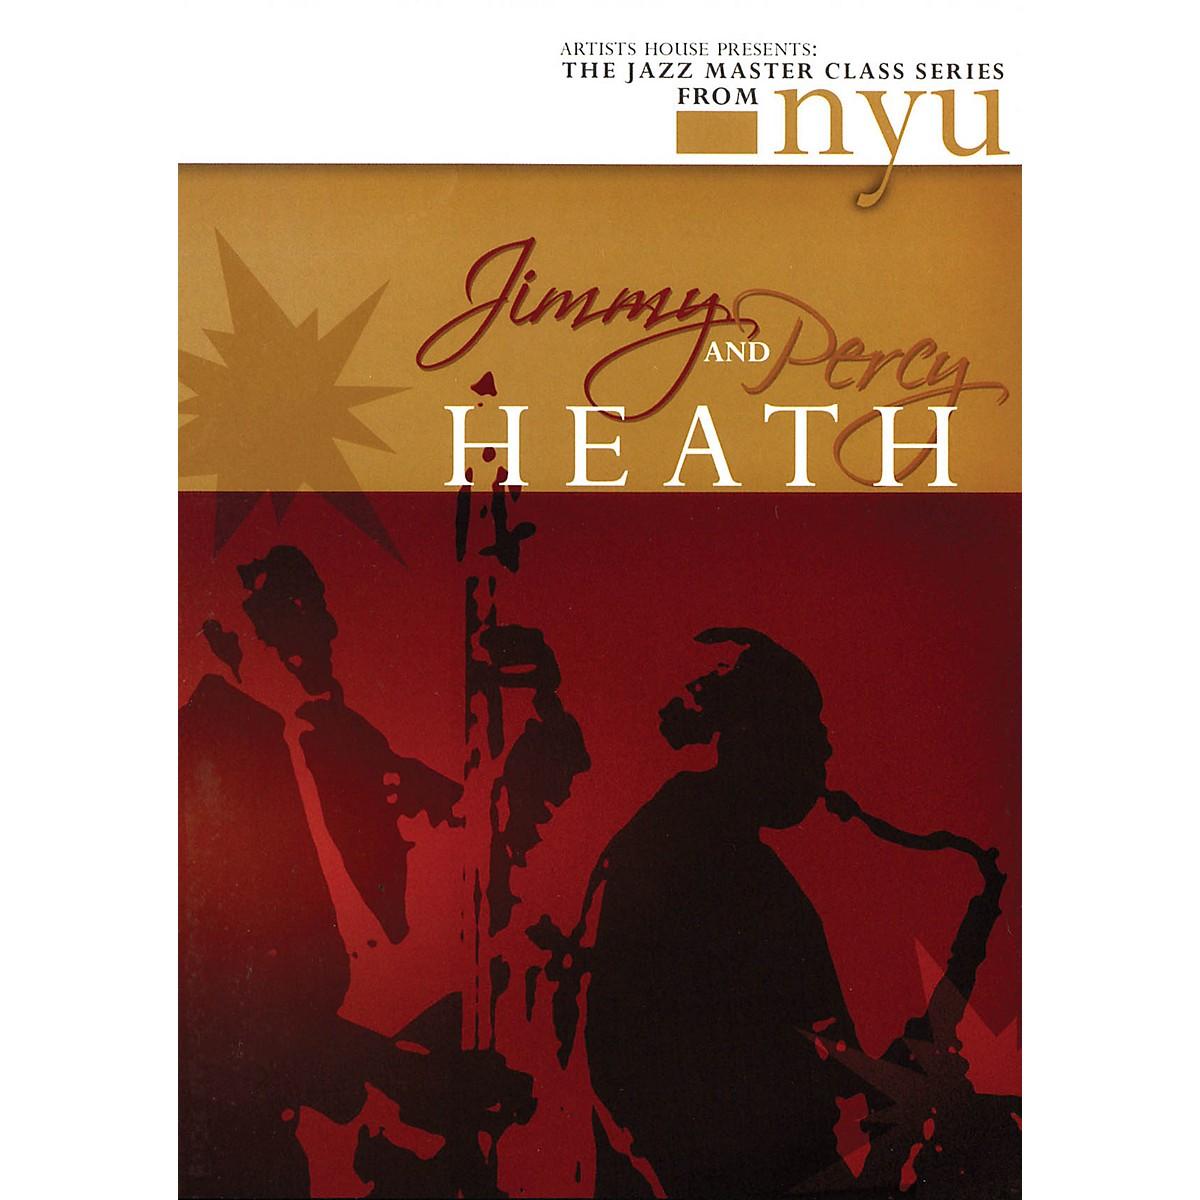 Artists House Jimmy & Percy Heath - The Jazz Master Class Series from NYU (2-DVD Set) DVD Series DVD by Jimmy Heath